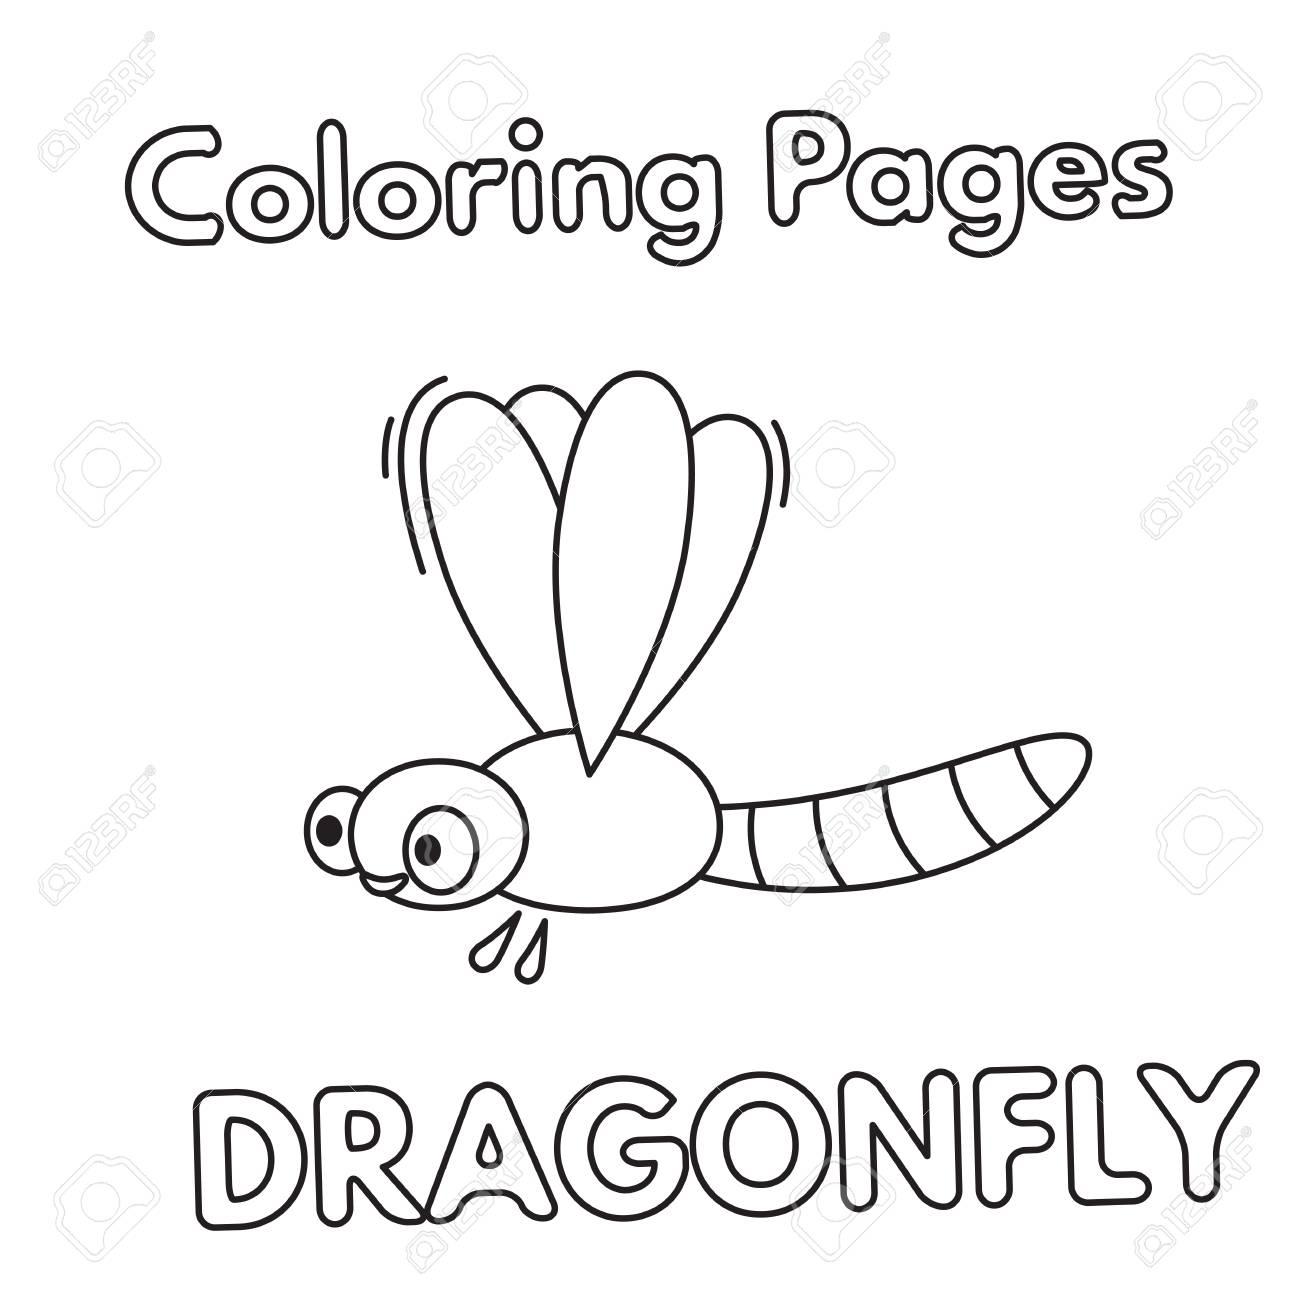 Cartoon Dragonfly Coloring Book